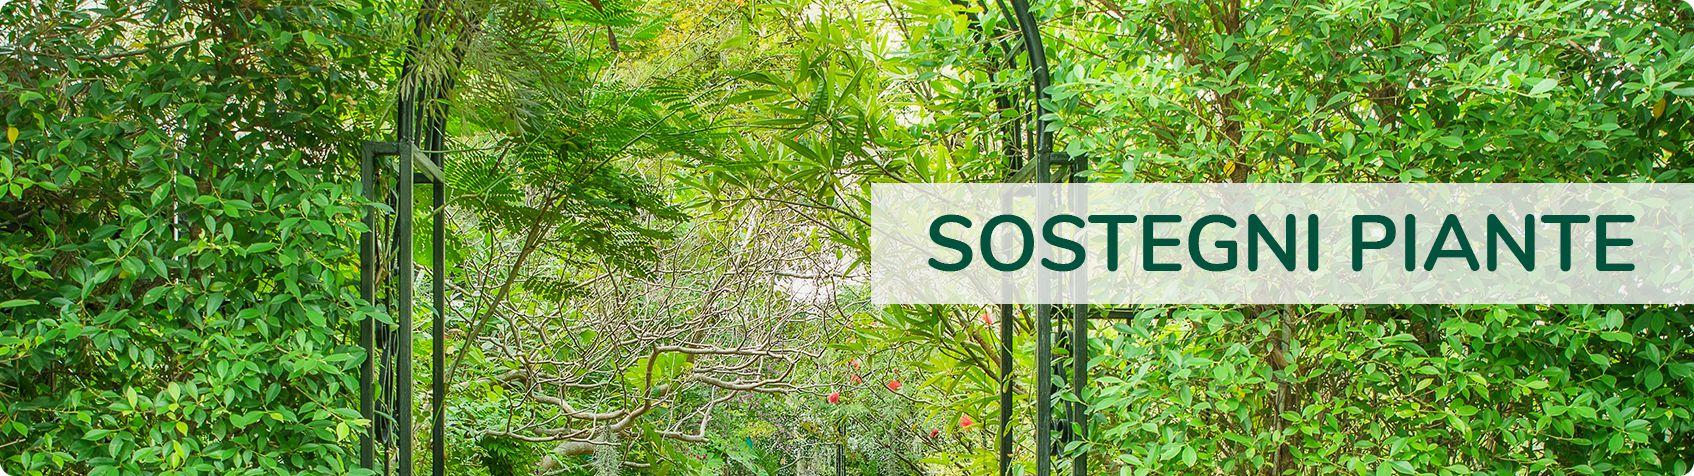 Tutori Per Rose Rampicanti vendita di sostegni per piante